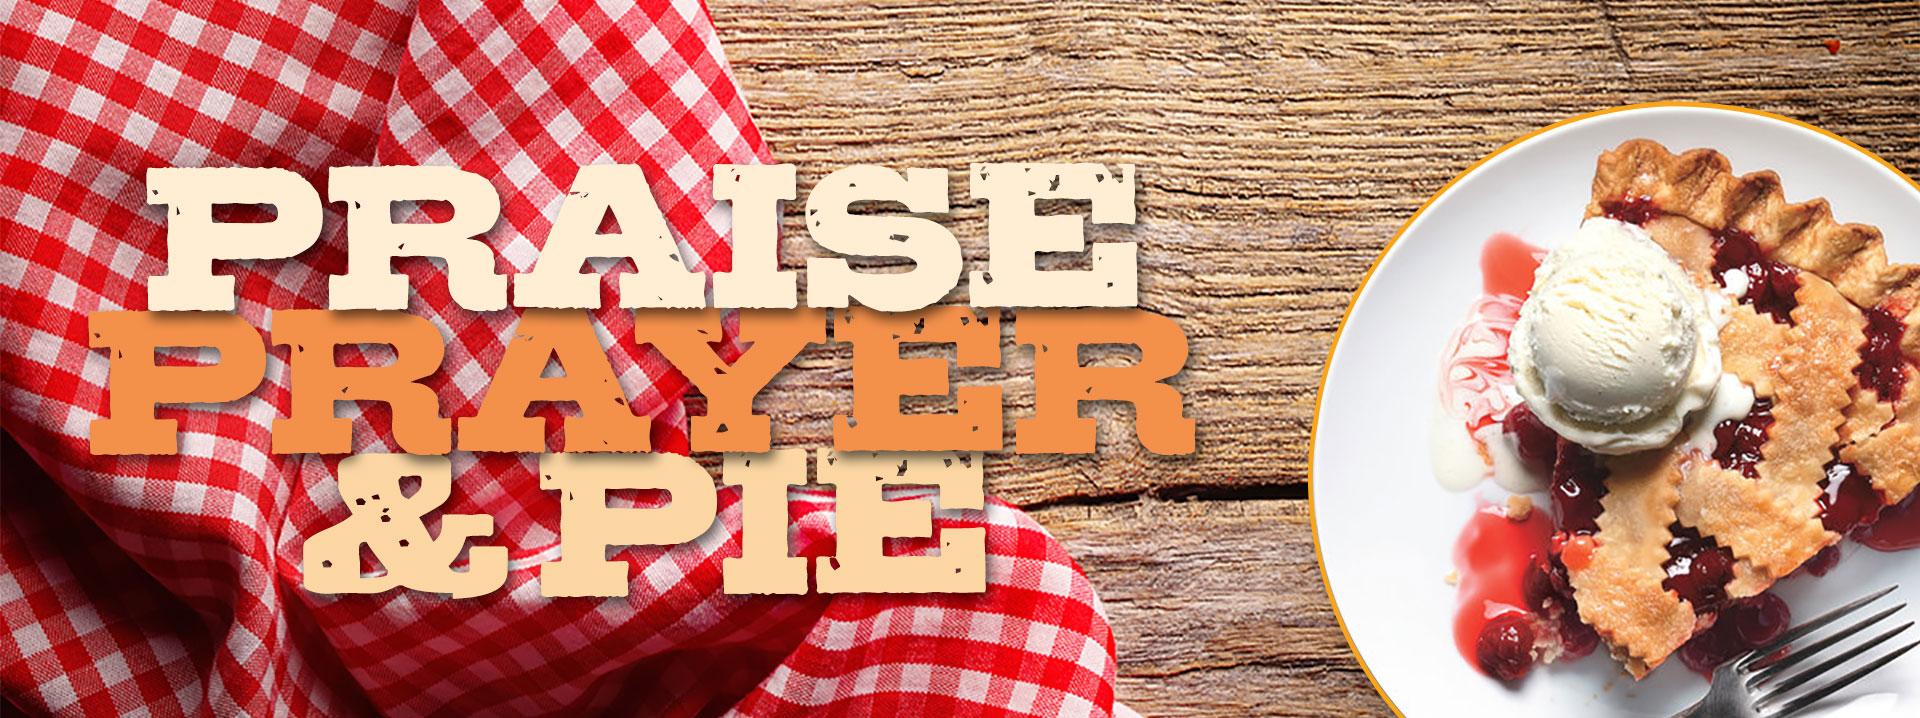 Praise Prayer and Pie